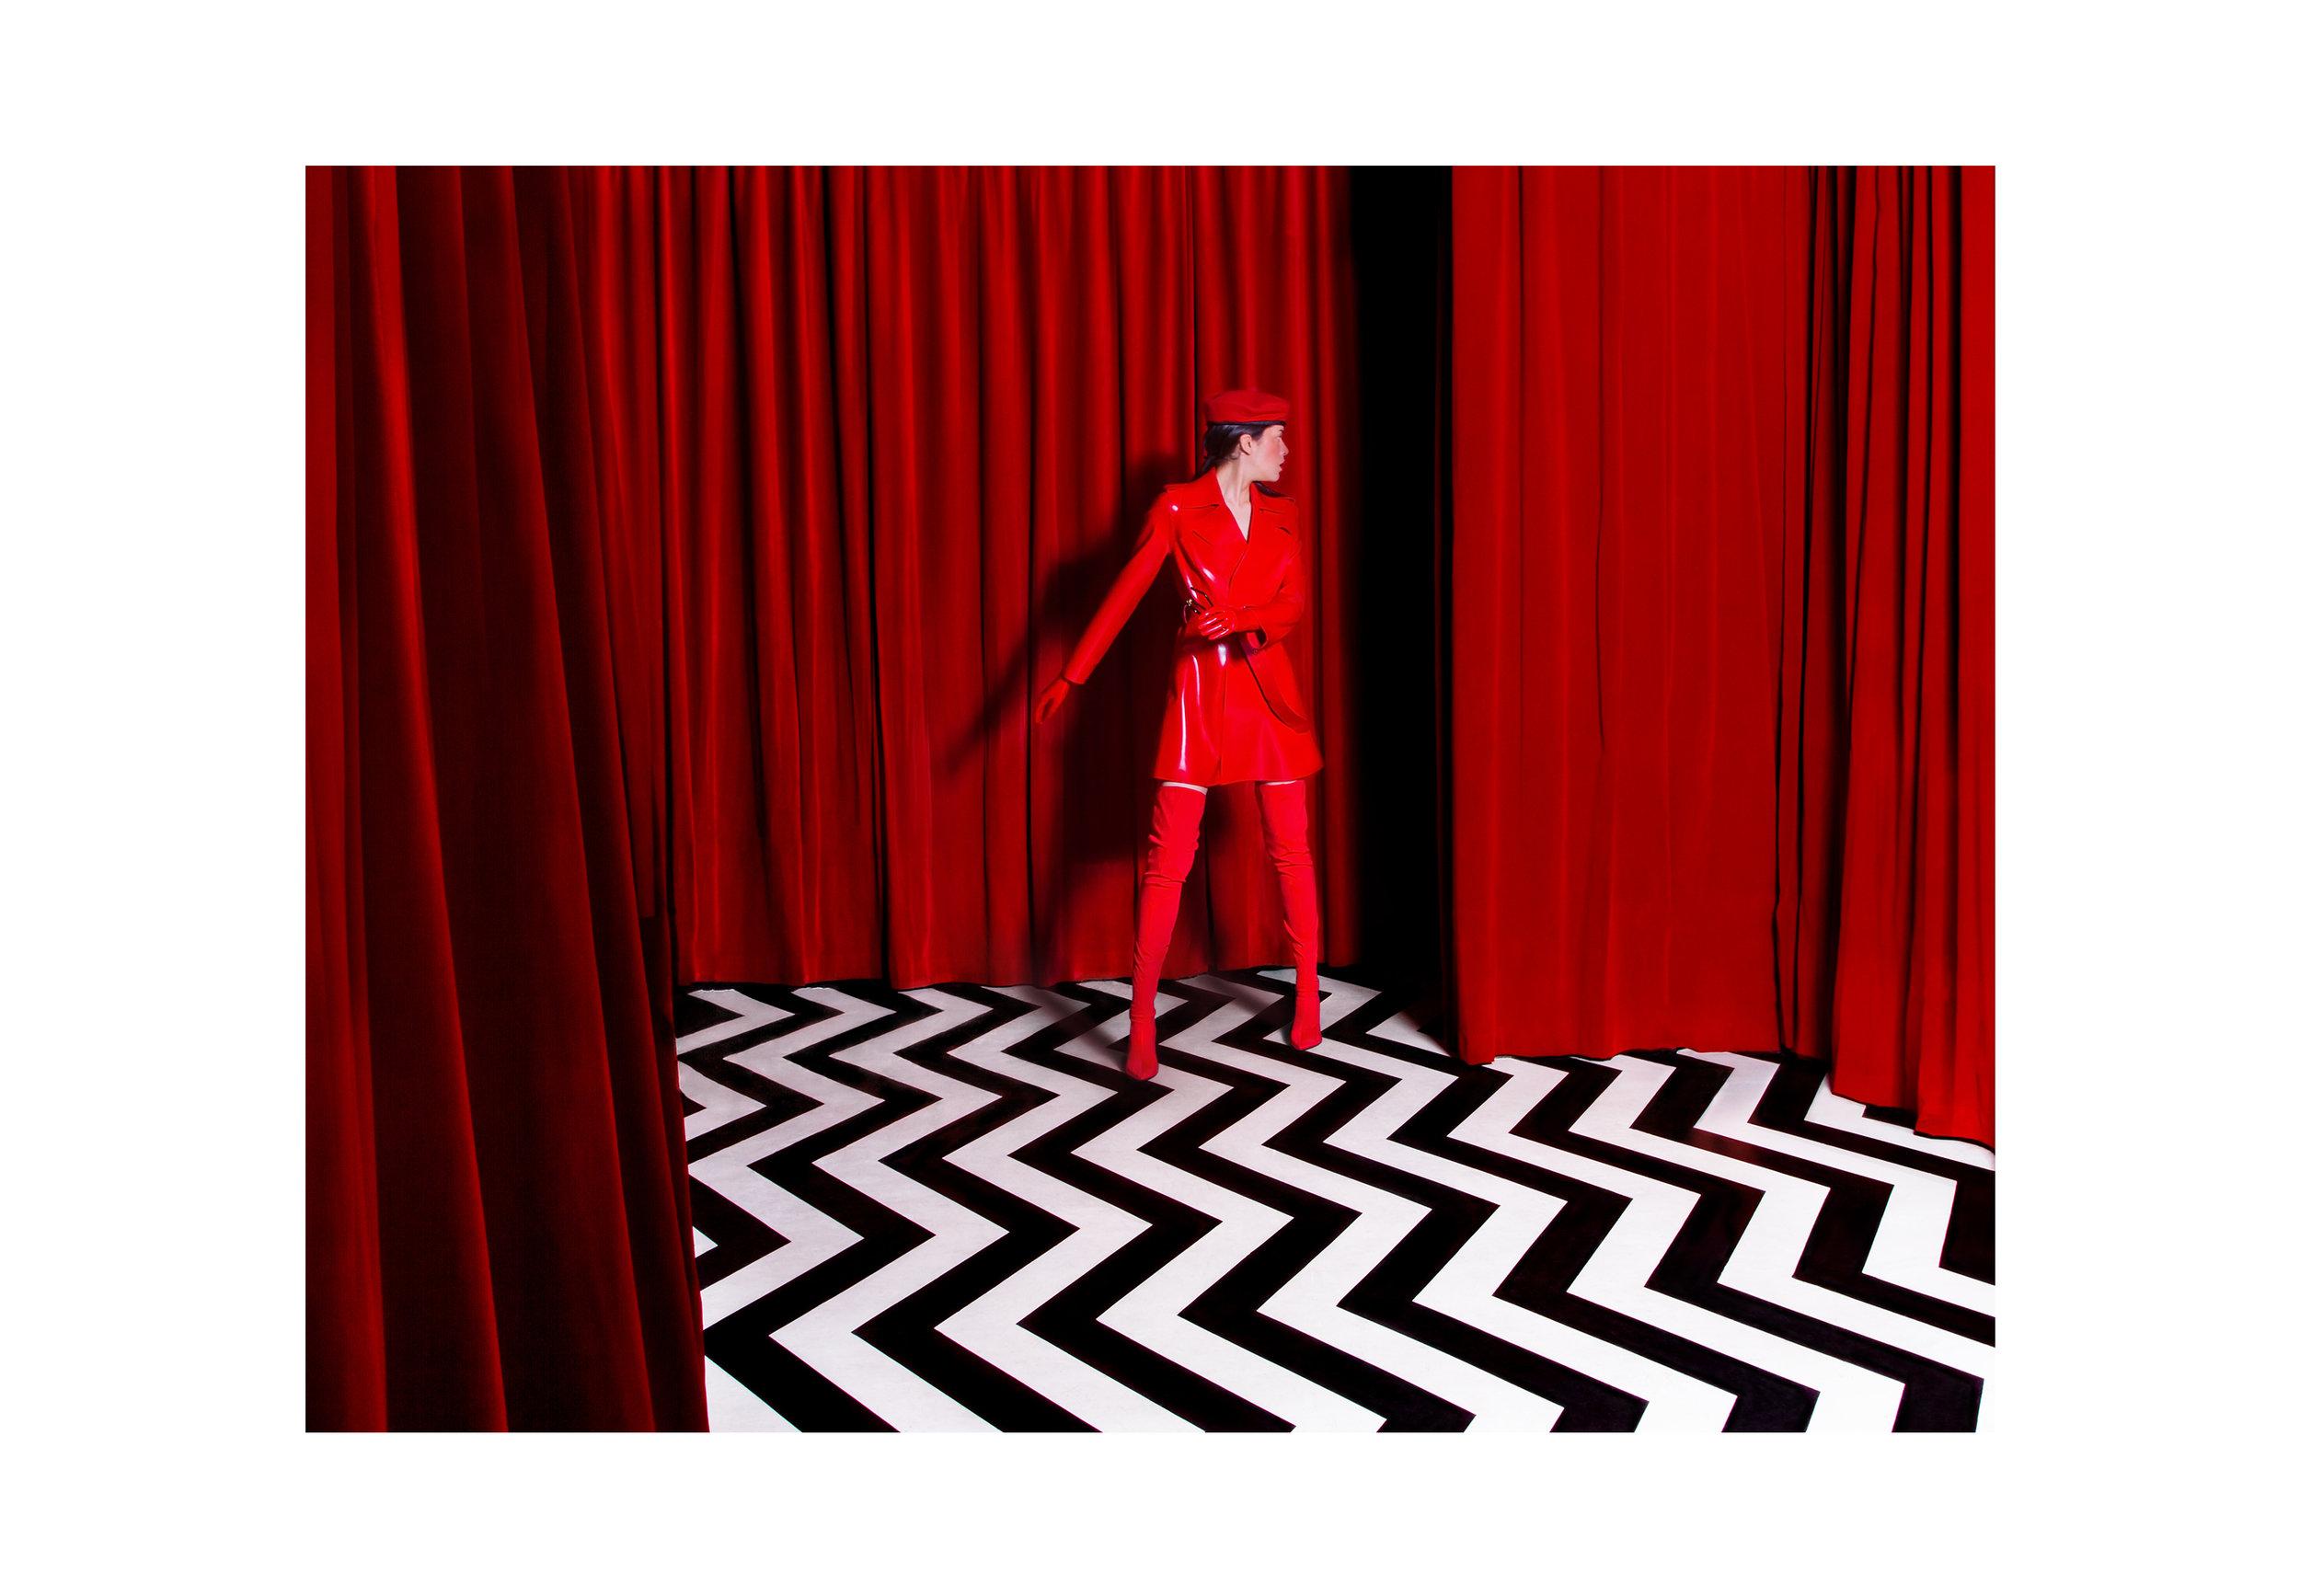 Fashion-Editorial-1-The-Black-Lodge-Dream-fashion-Matthew-Coleman-Photography.jpg